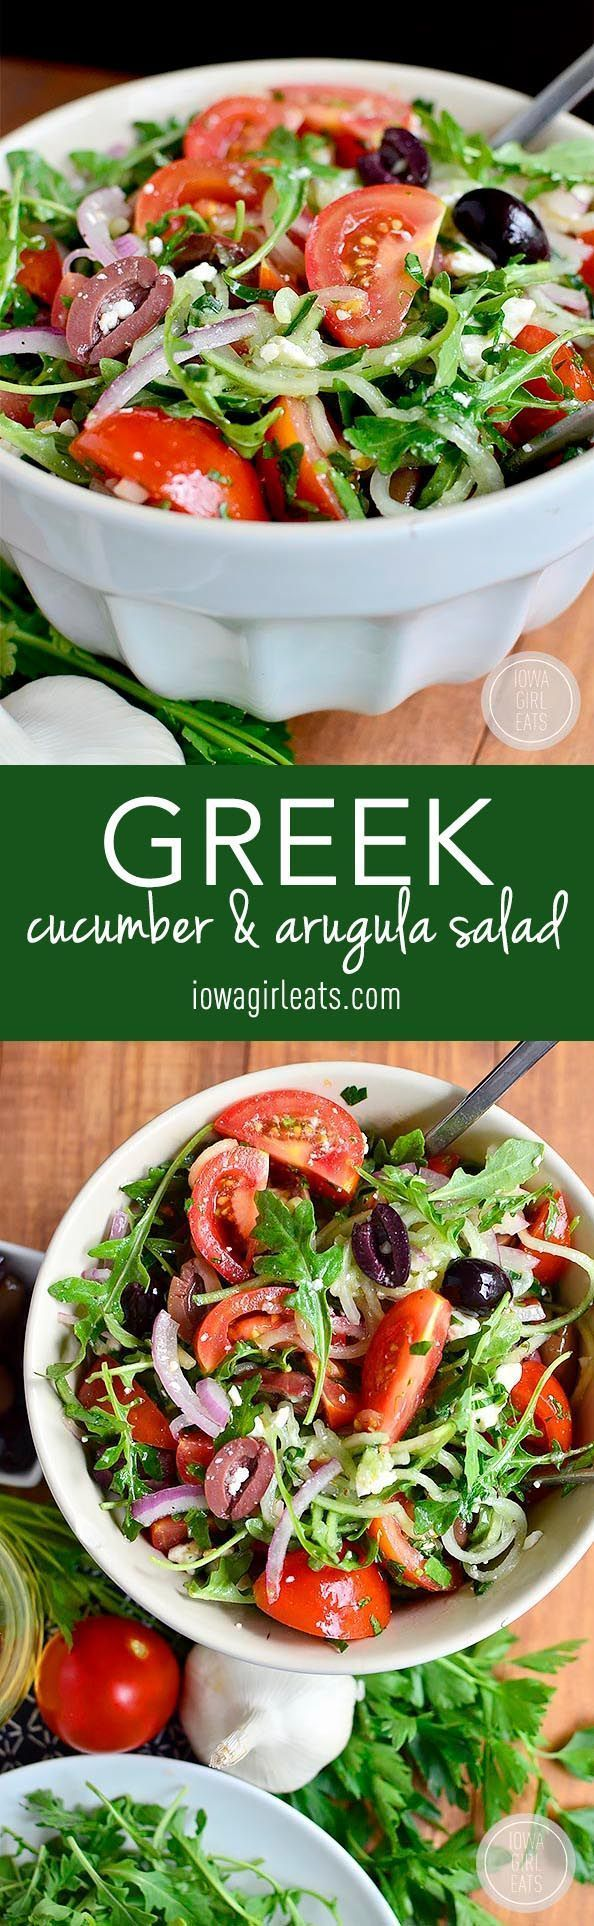 Greek Cucumber and Arugula Salad - Iowa Girl Eats